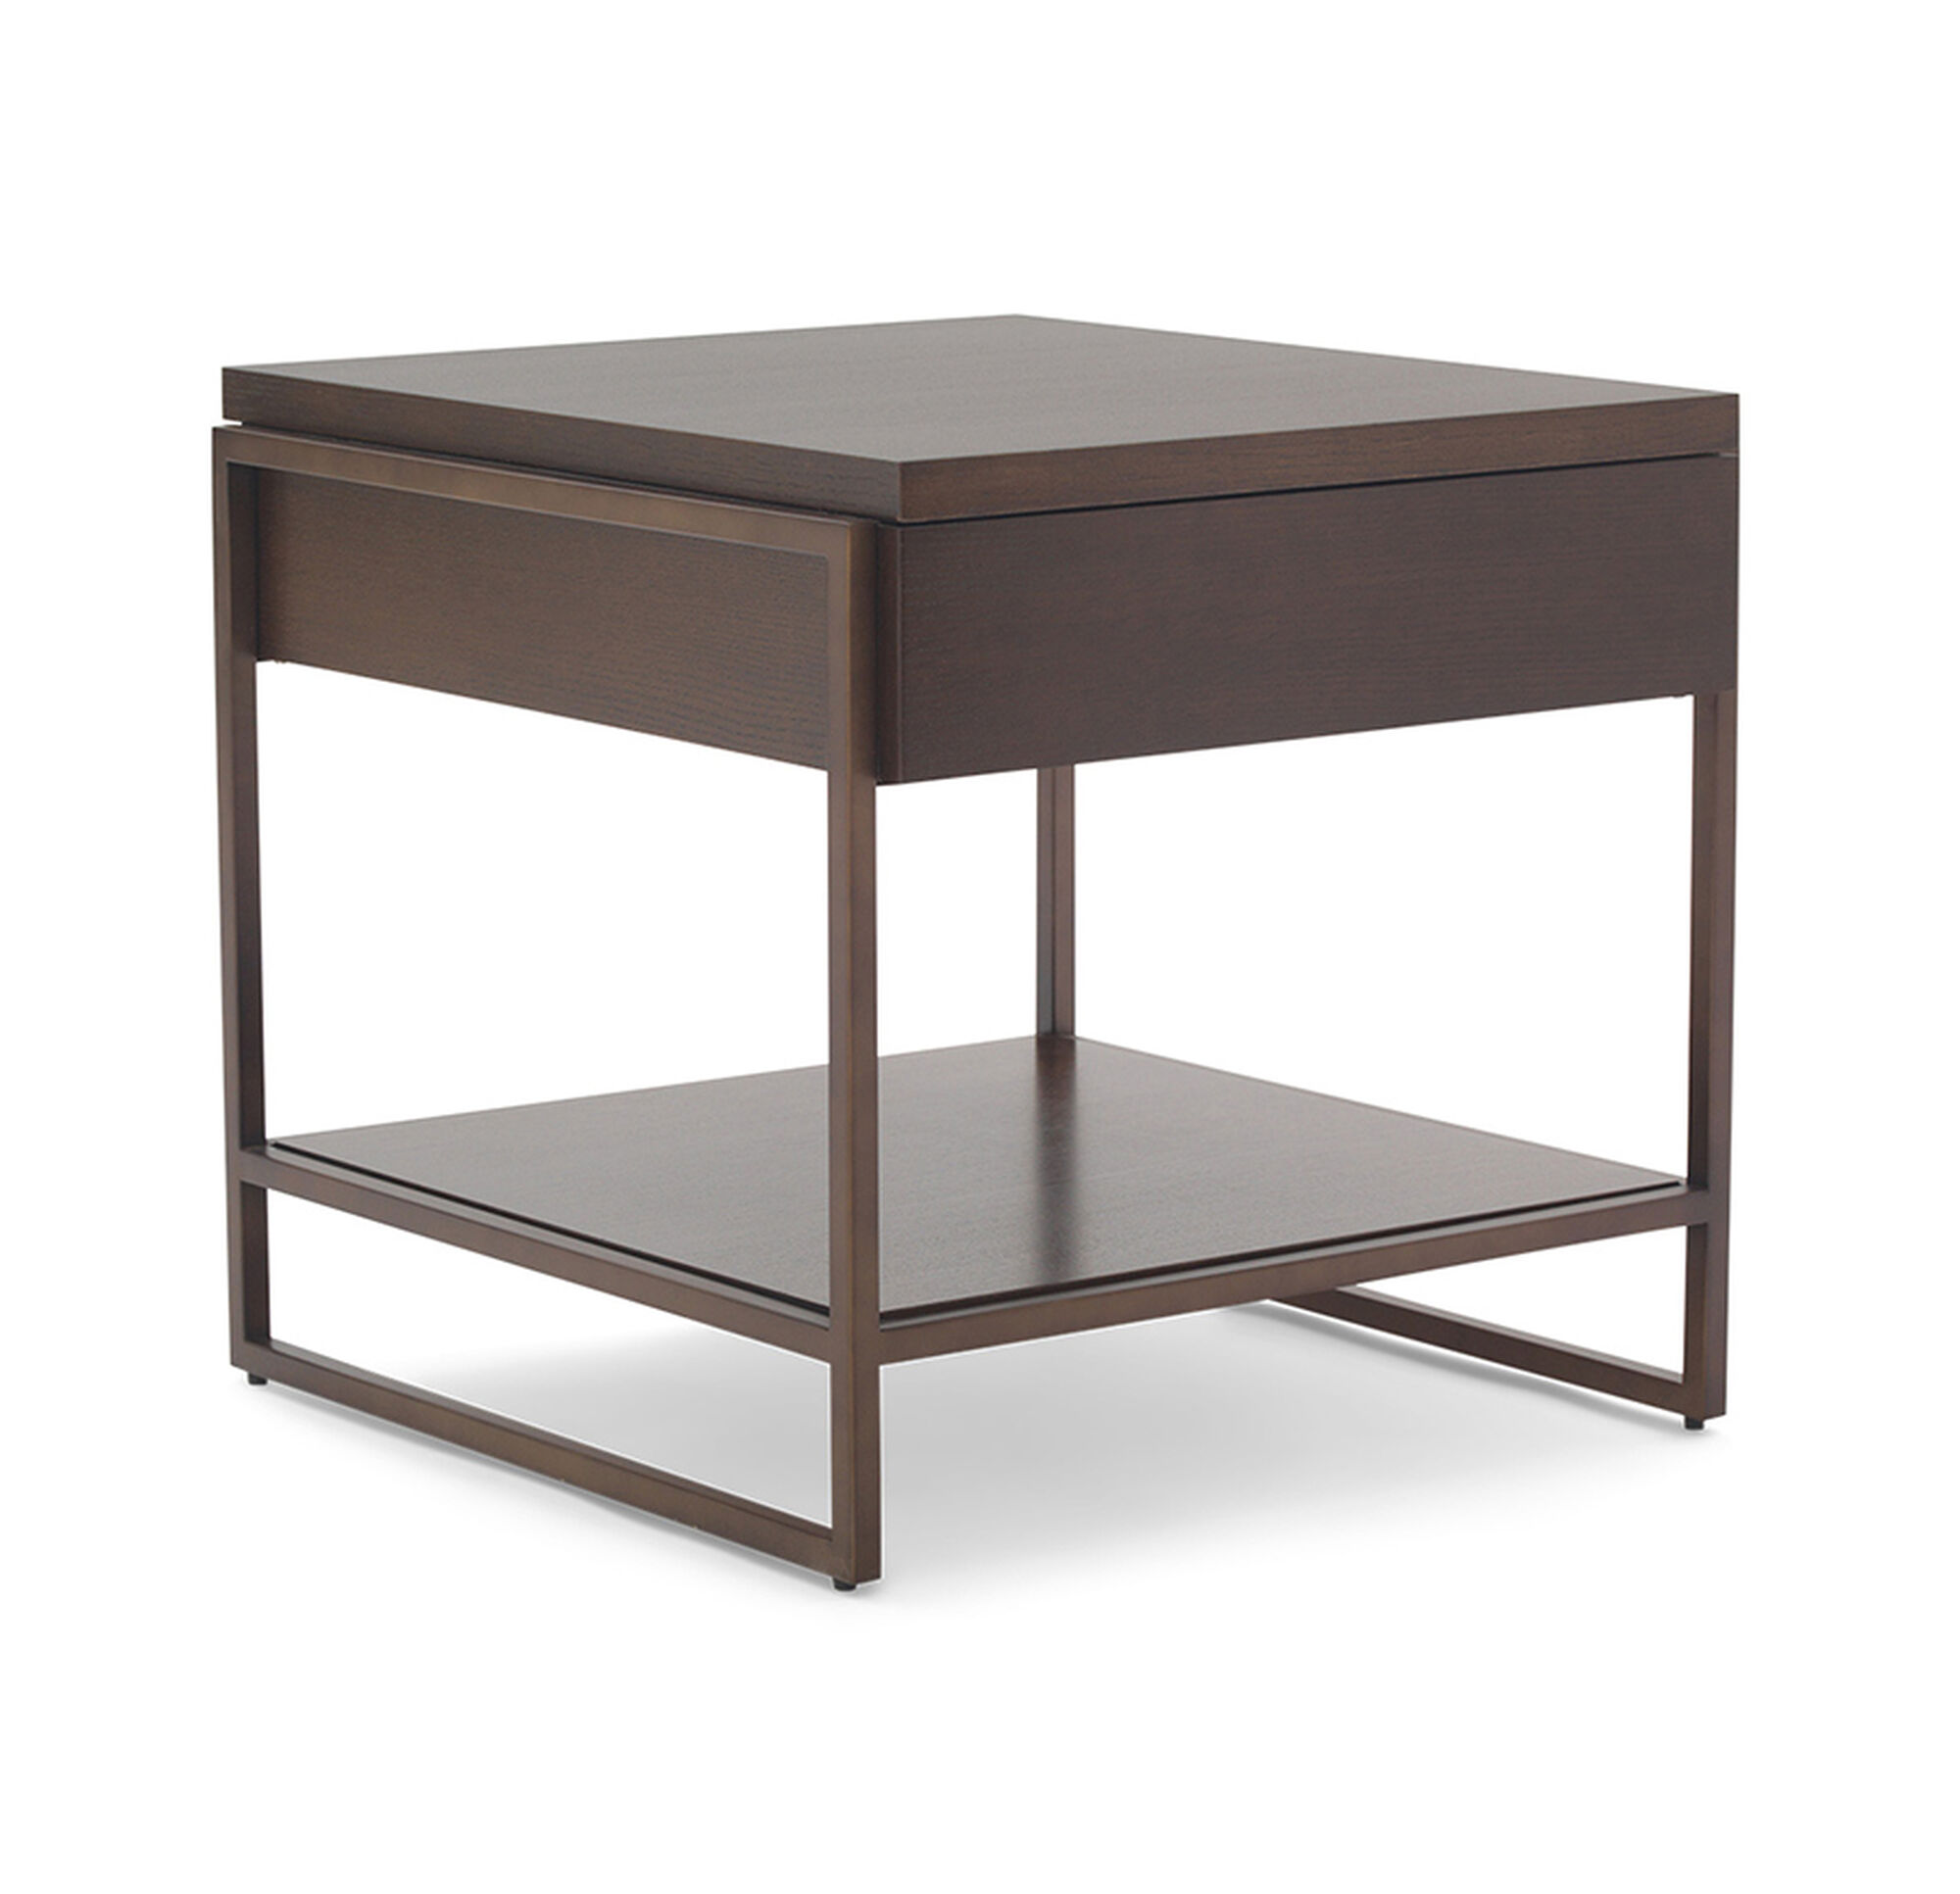 modern com baby table viendoraglass mid drawer sidetable century tables side floating